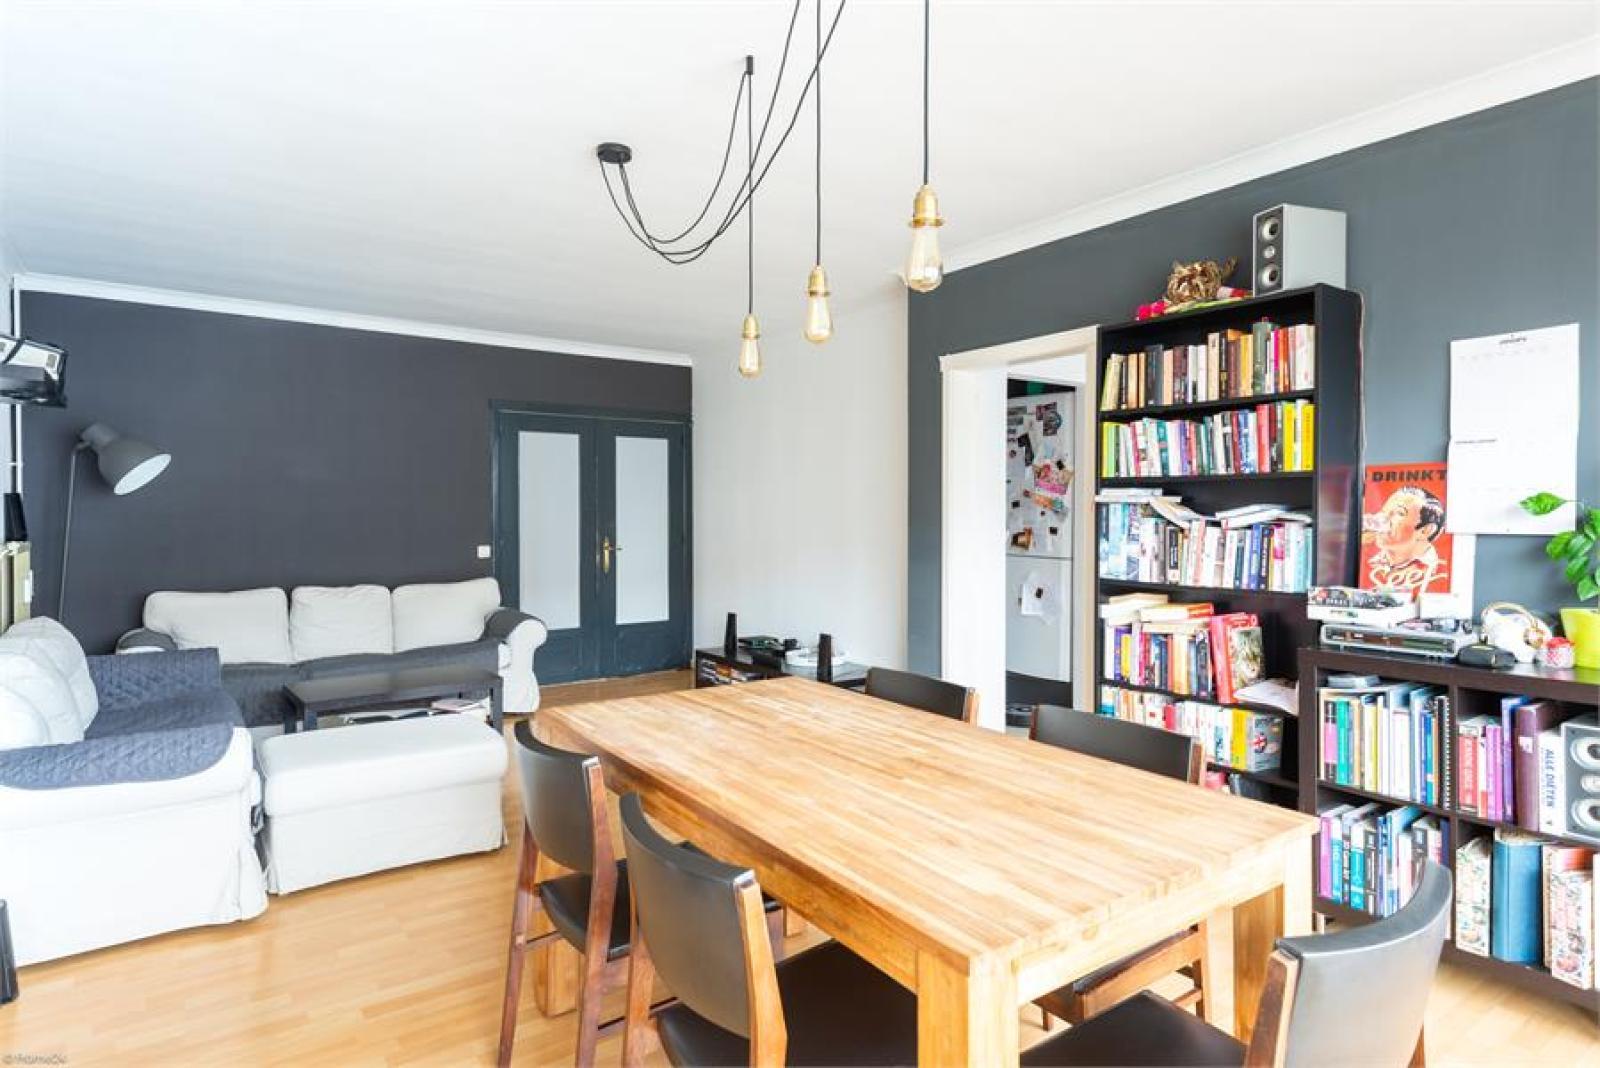 Instapklaar appartement (77 m²) met twee slaapkamers op centrale ligging te Deurne! afbeelding 5